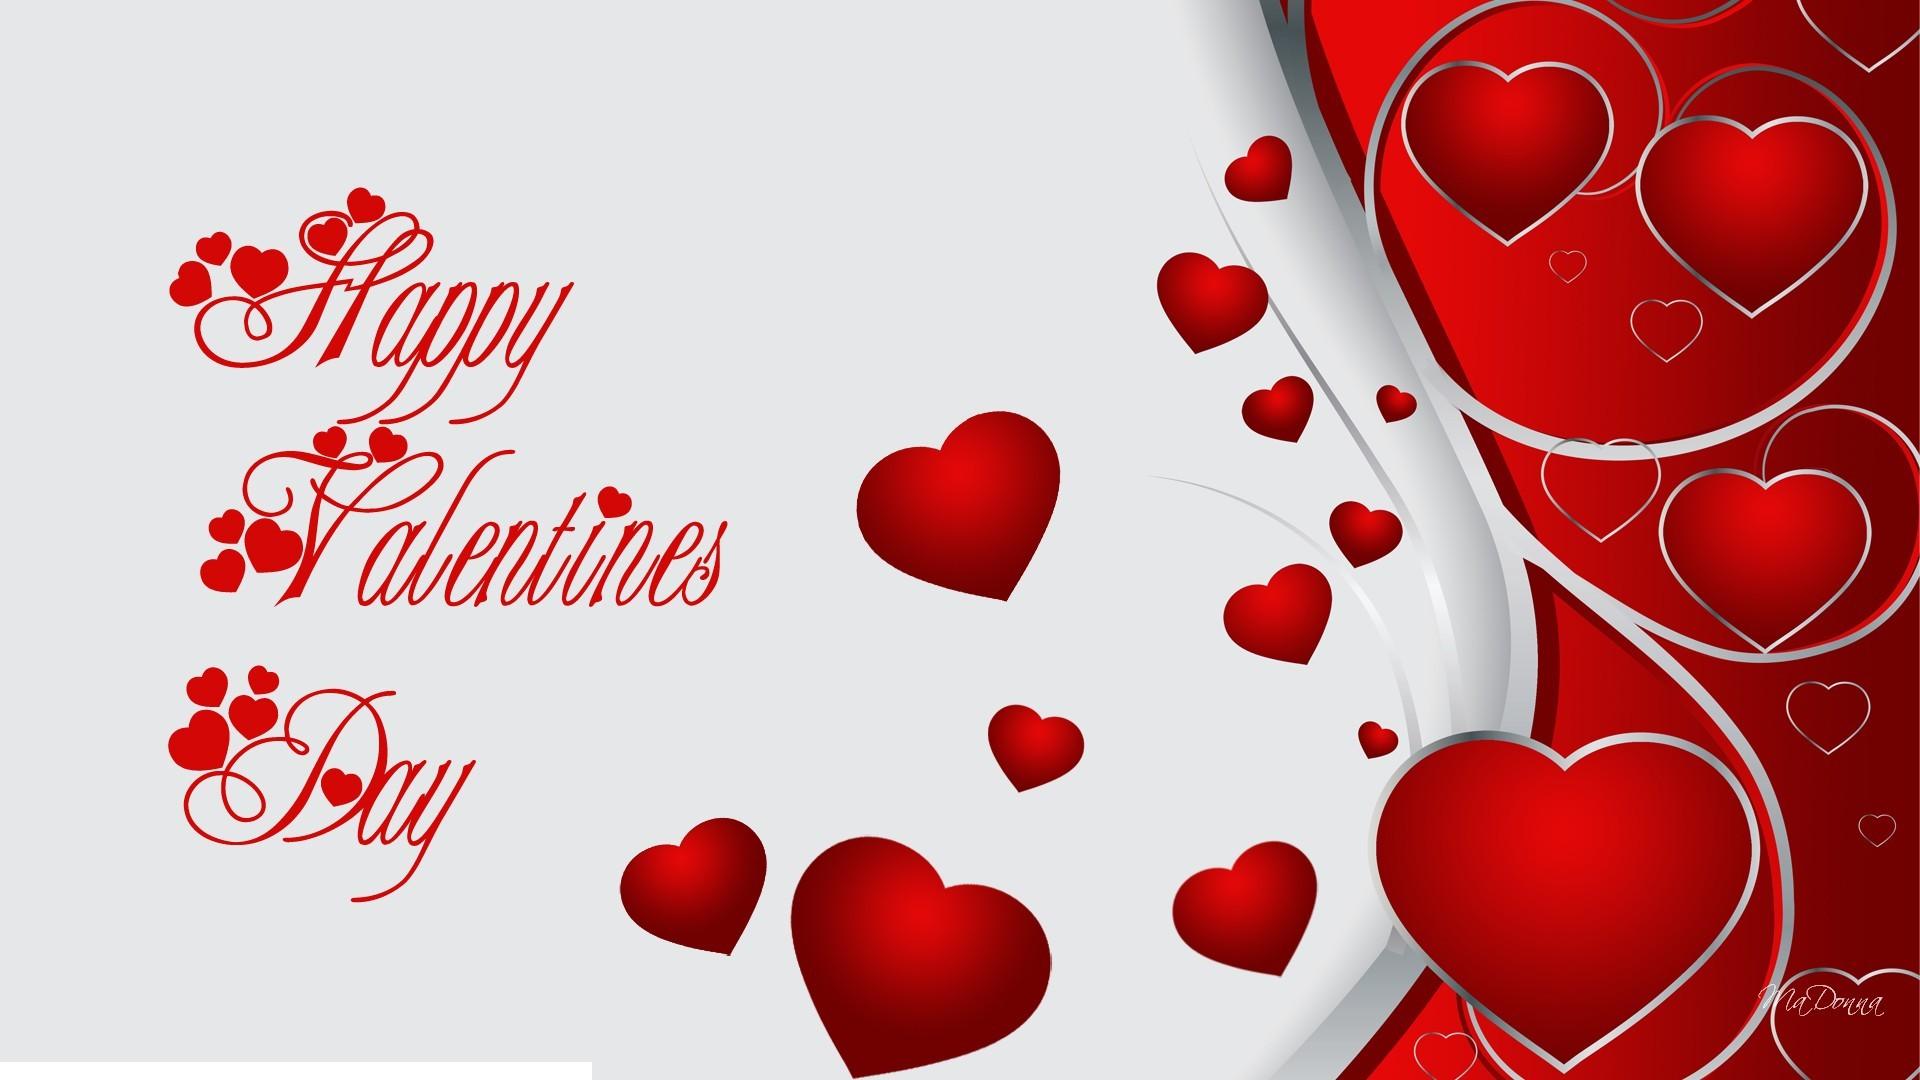 Valentine's Day SMS in Hindi